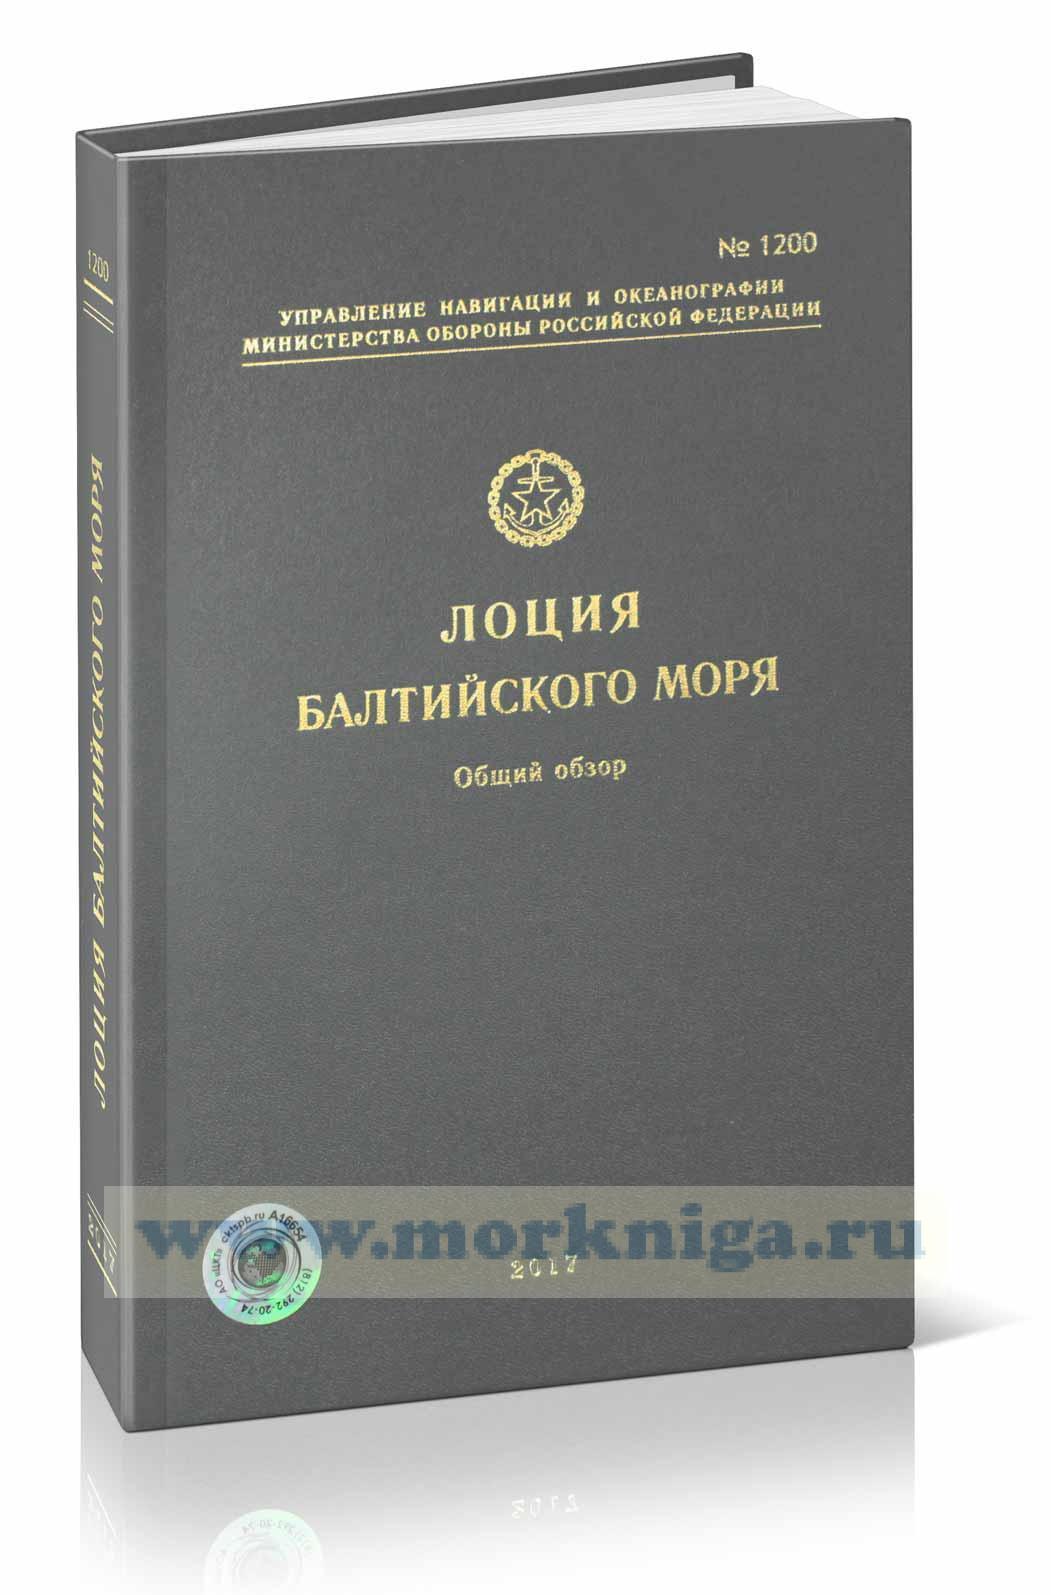 Лоция Балтийского моря. Общий обзор. Адм. № 1200